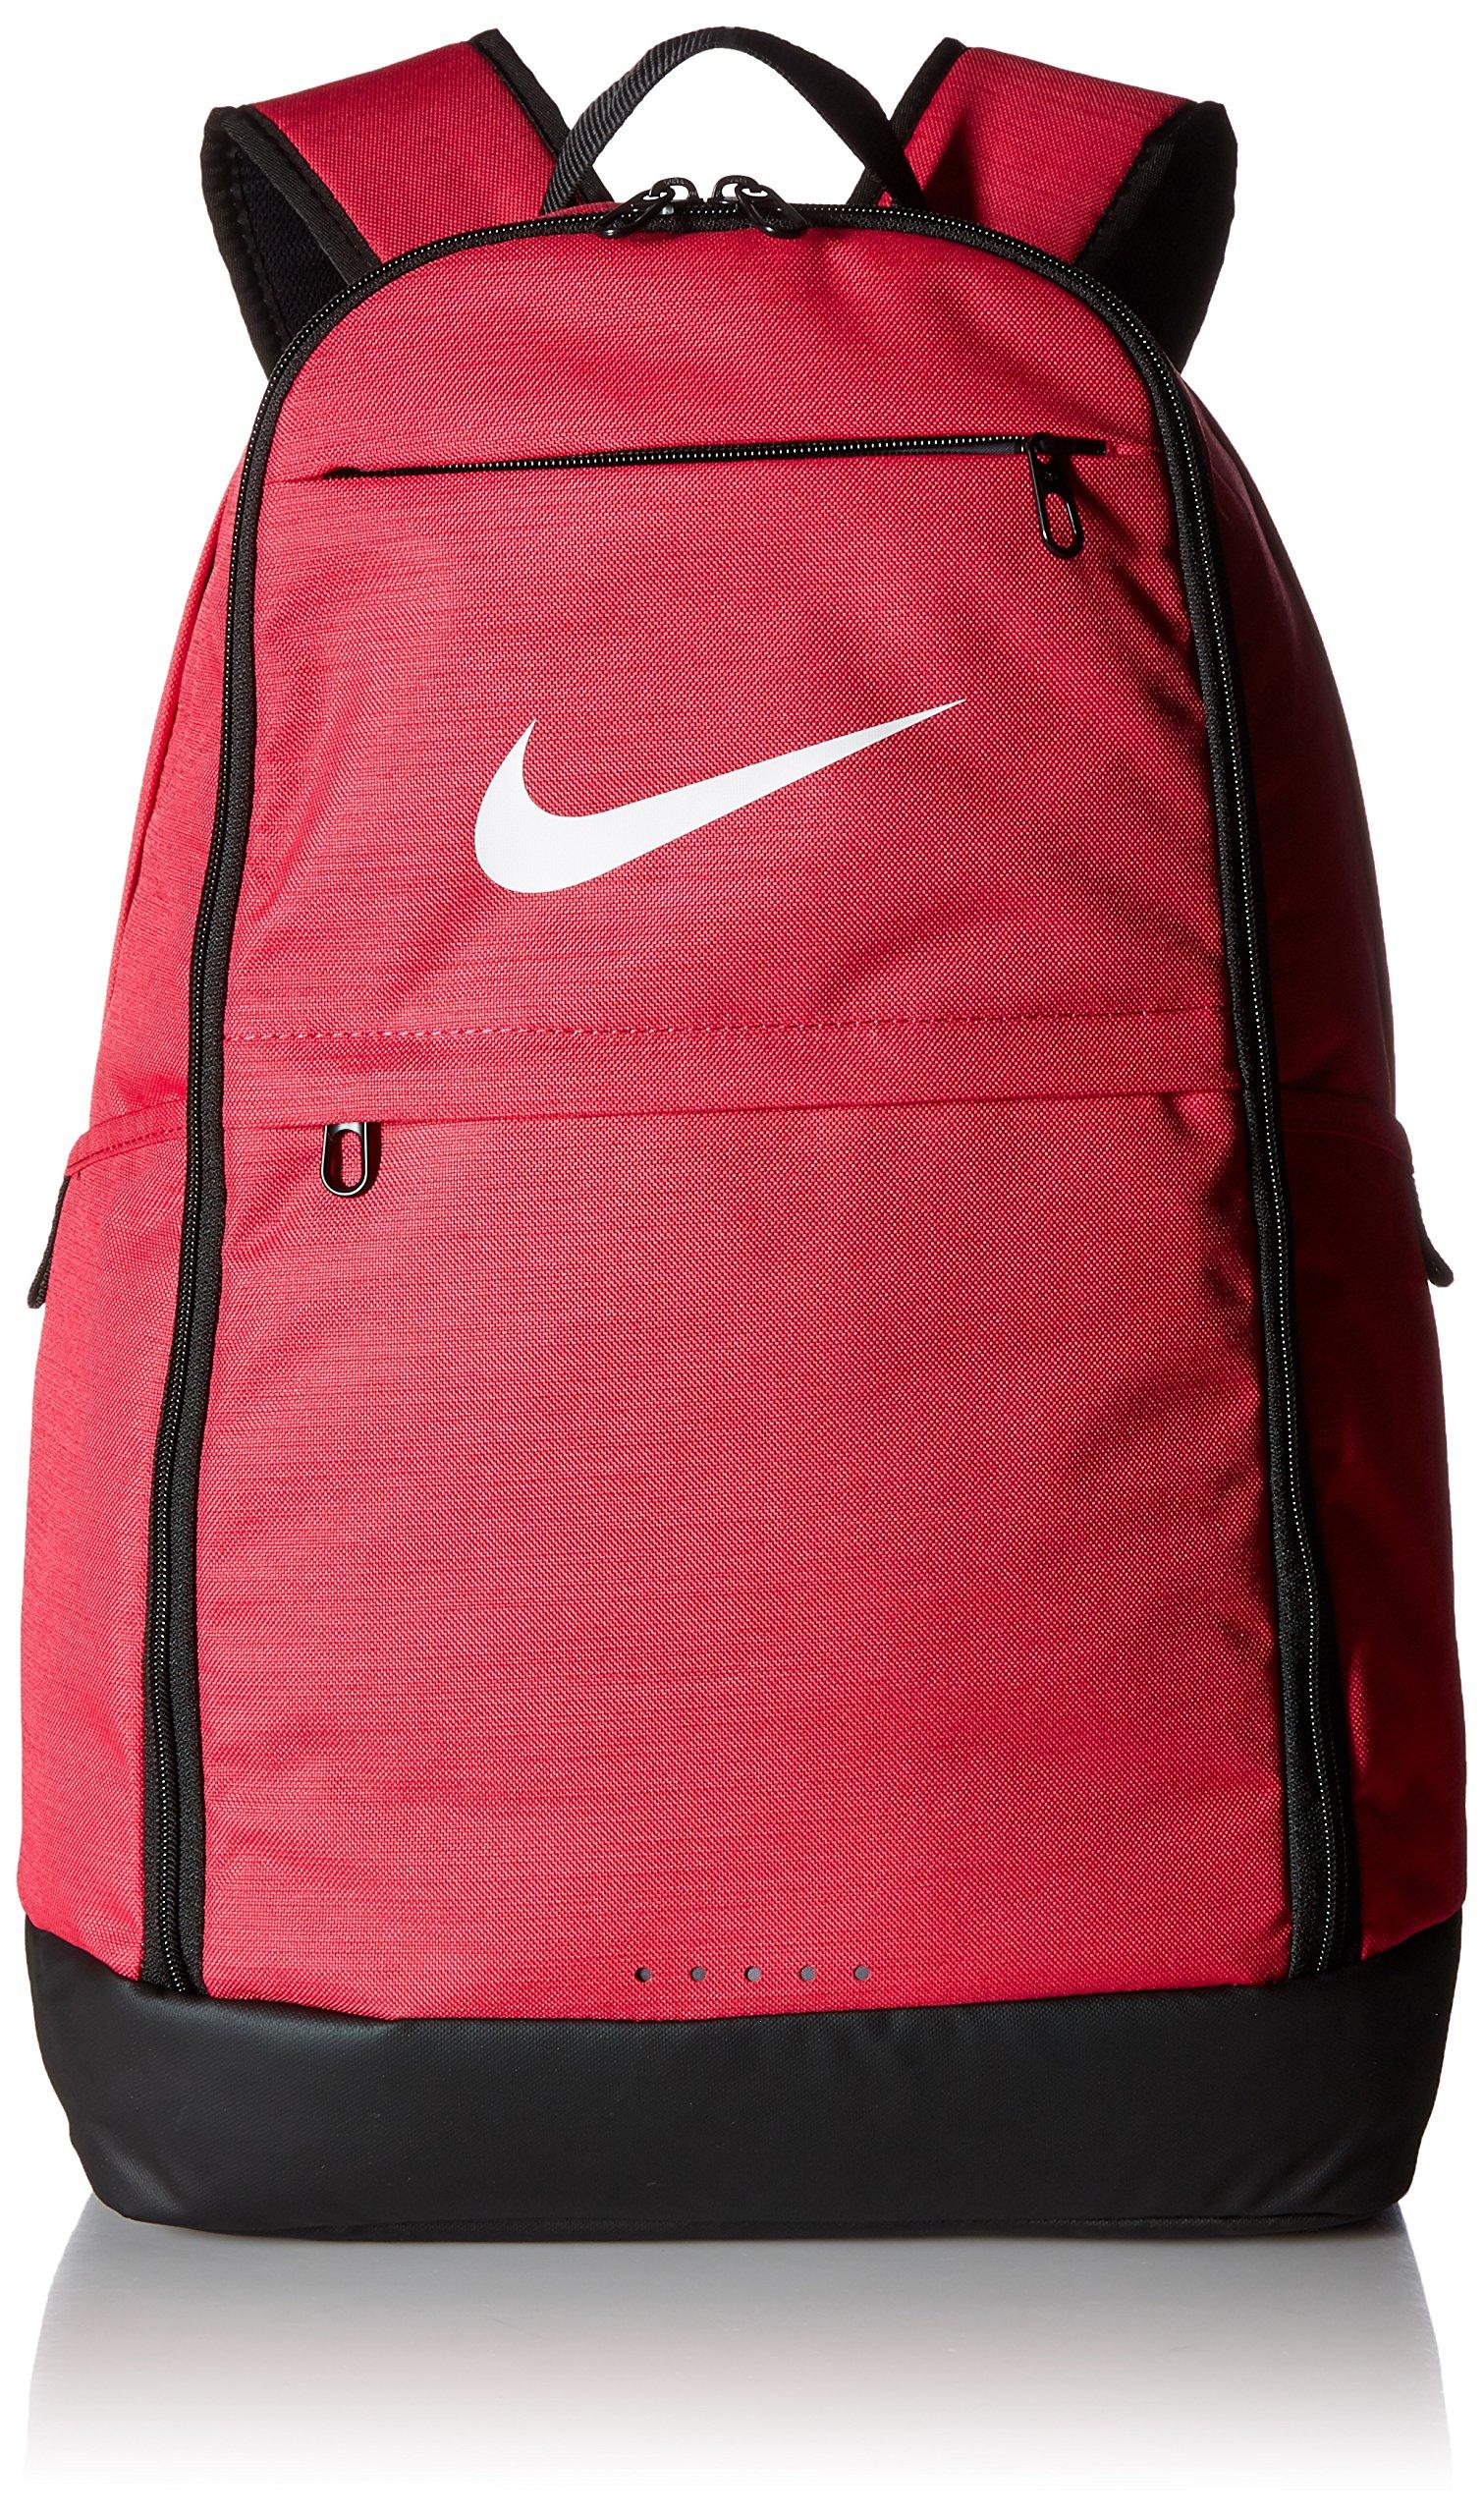 NIKE Brasilia Backpack, Rush Pink/Black/White, X-Large